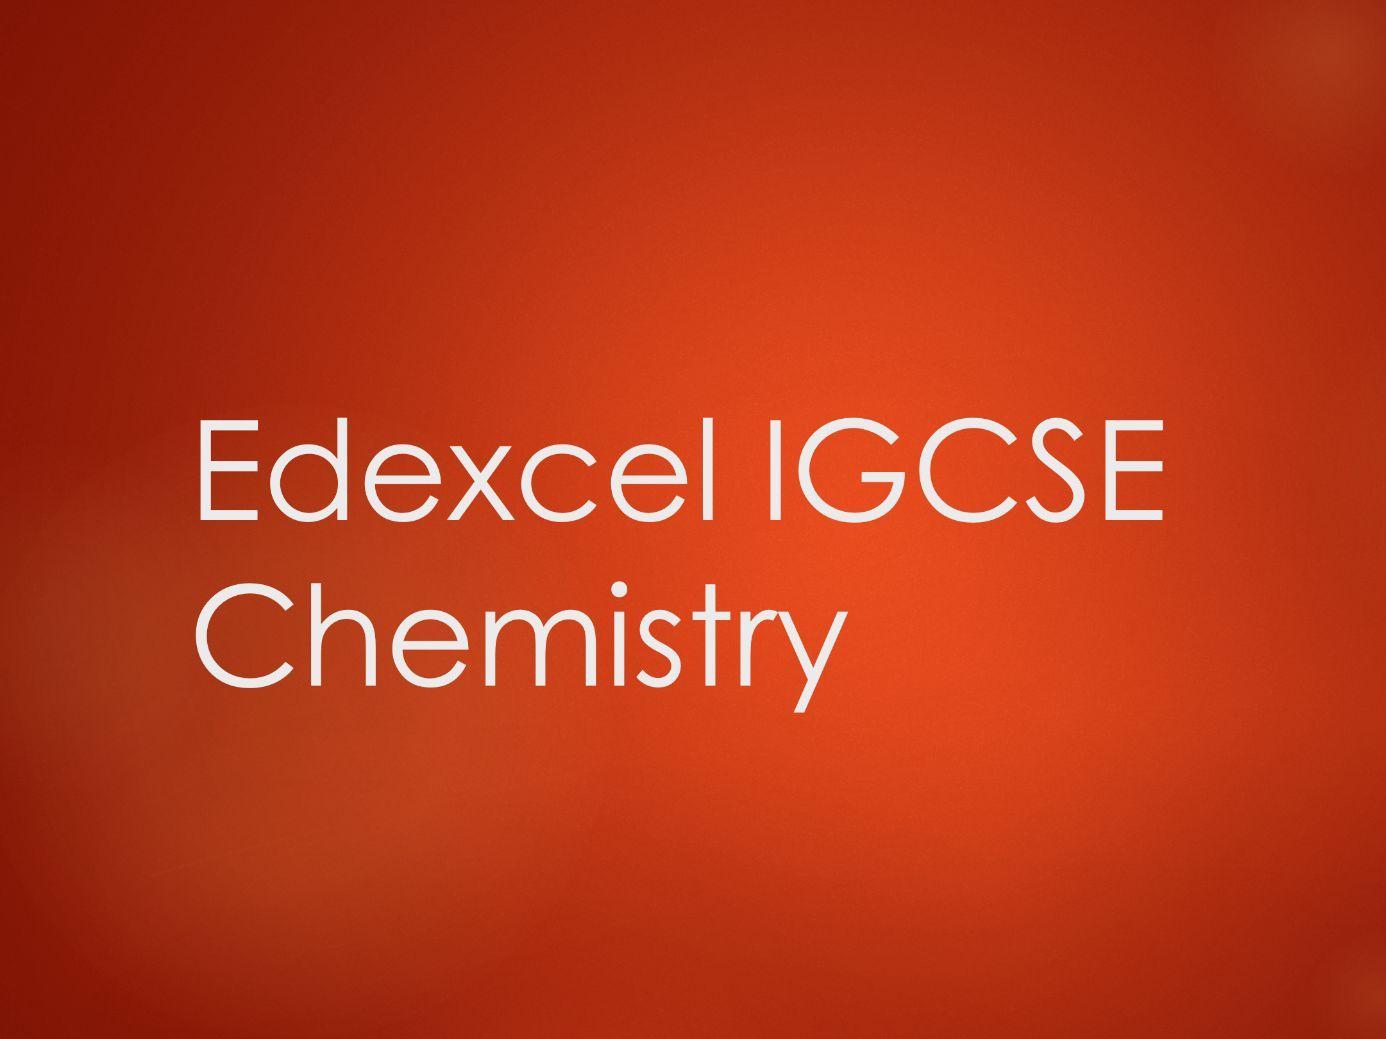 Chemistry Edexcel IGCSE PowerPoints - All units